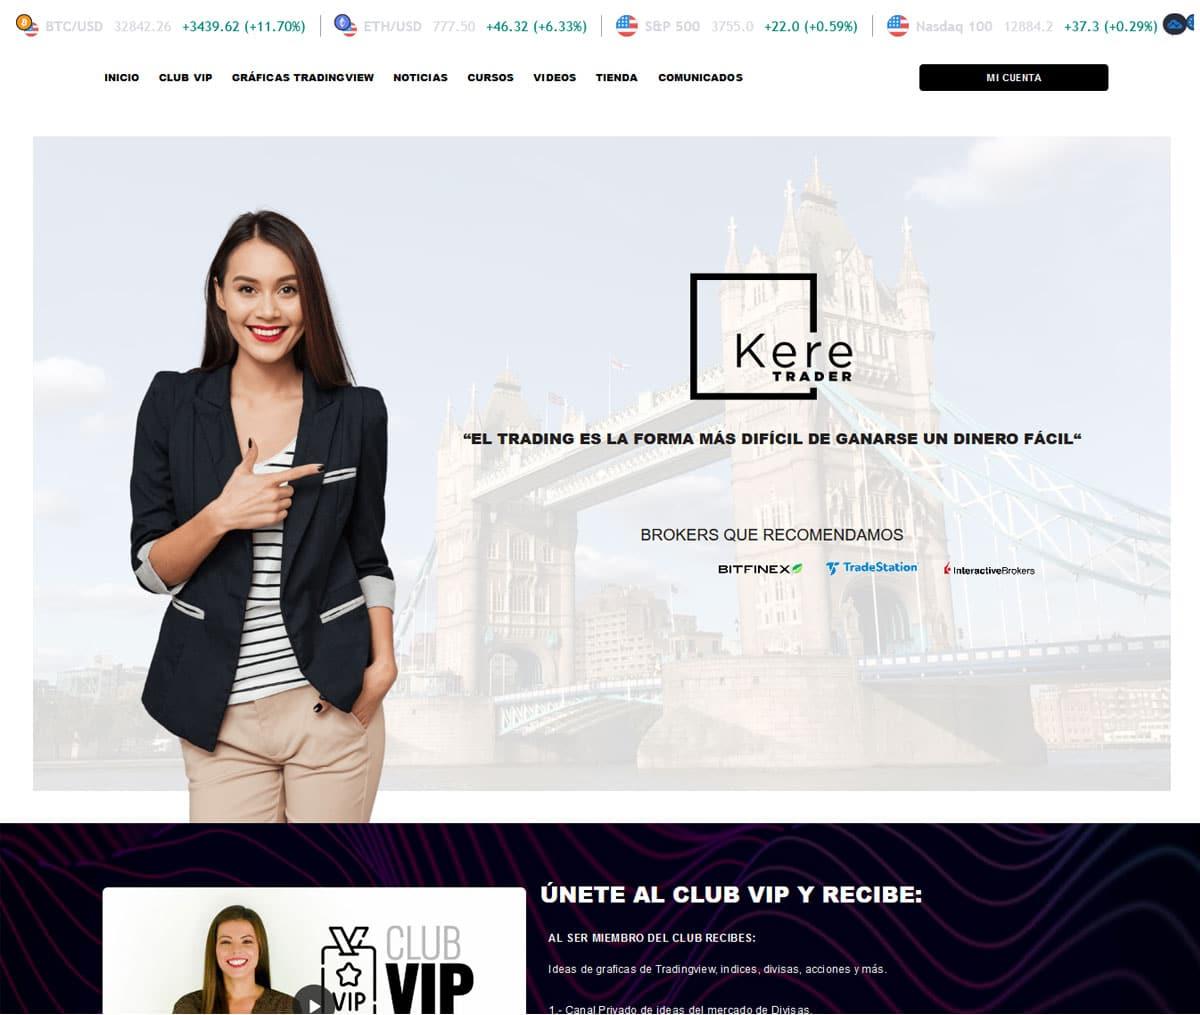 Página web de Kere Trader